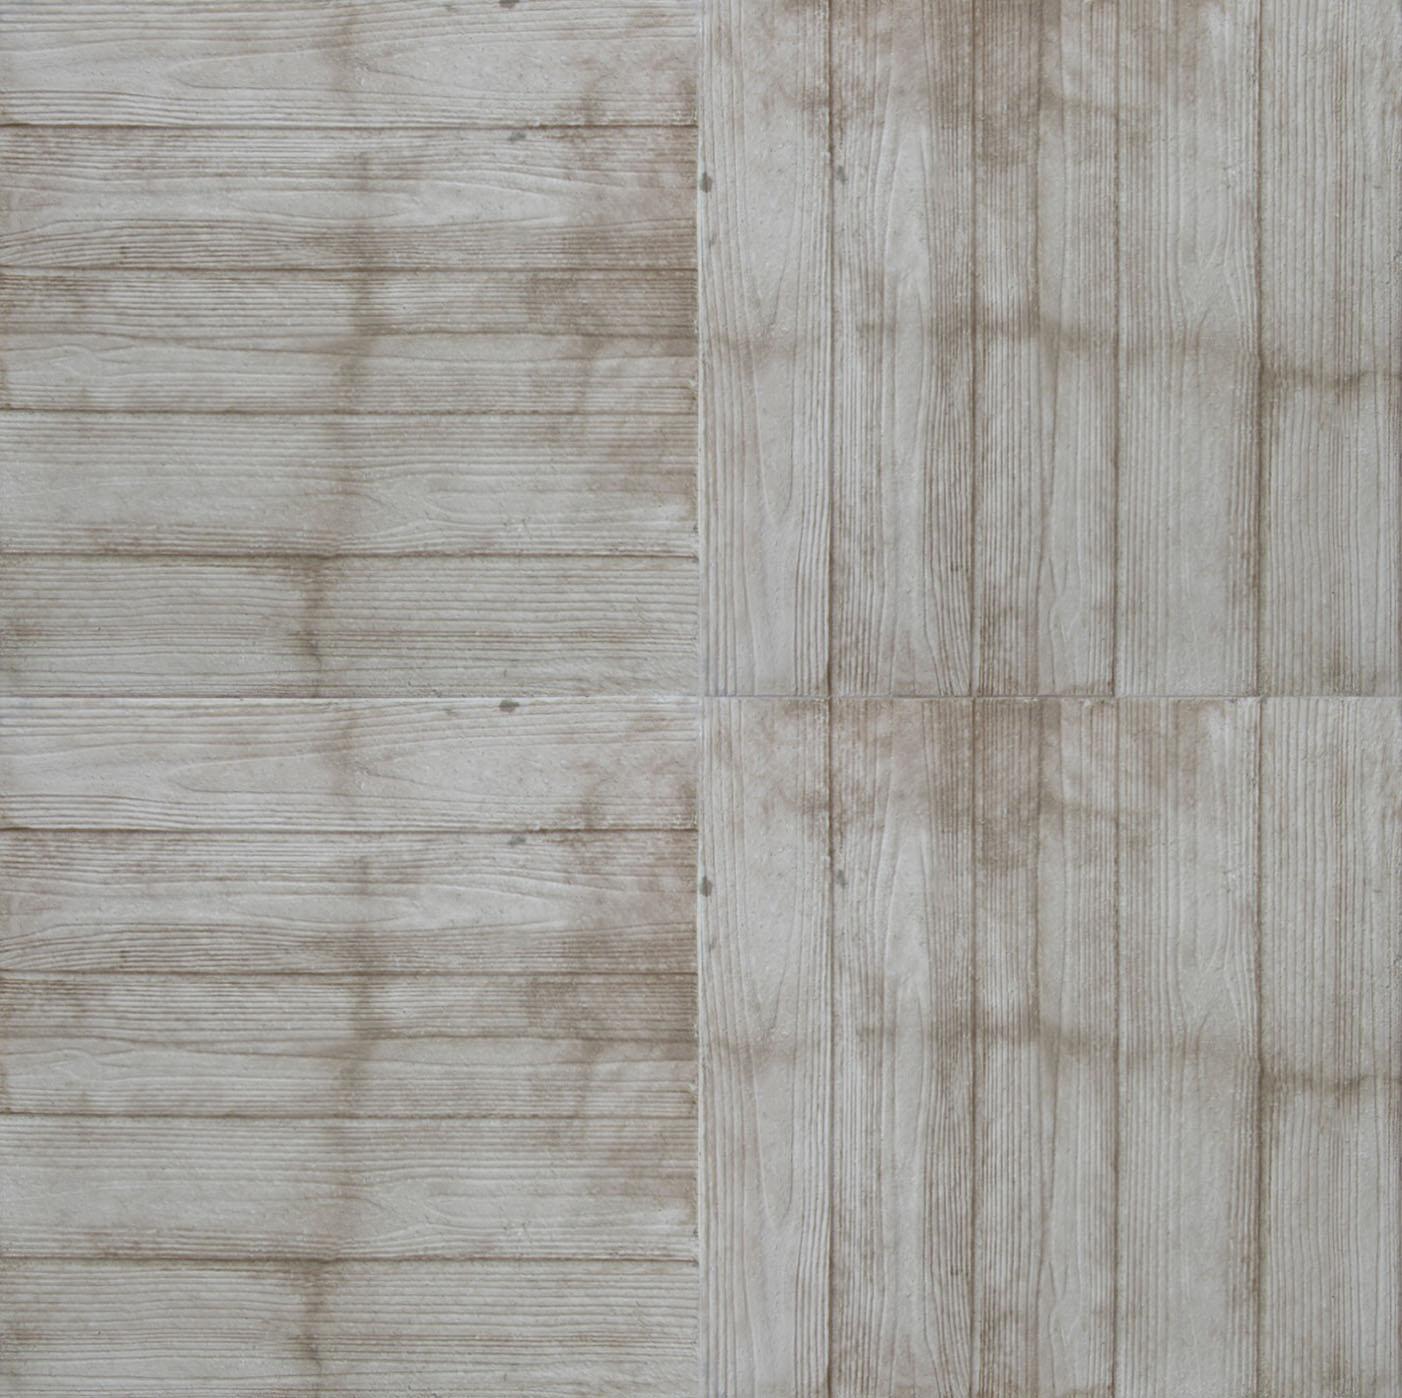 Madera 5-B Bicolor Marron-montaje